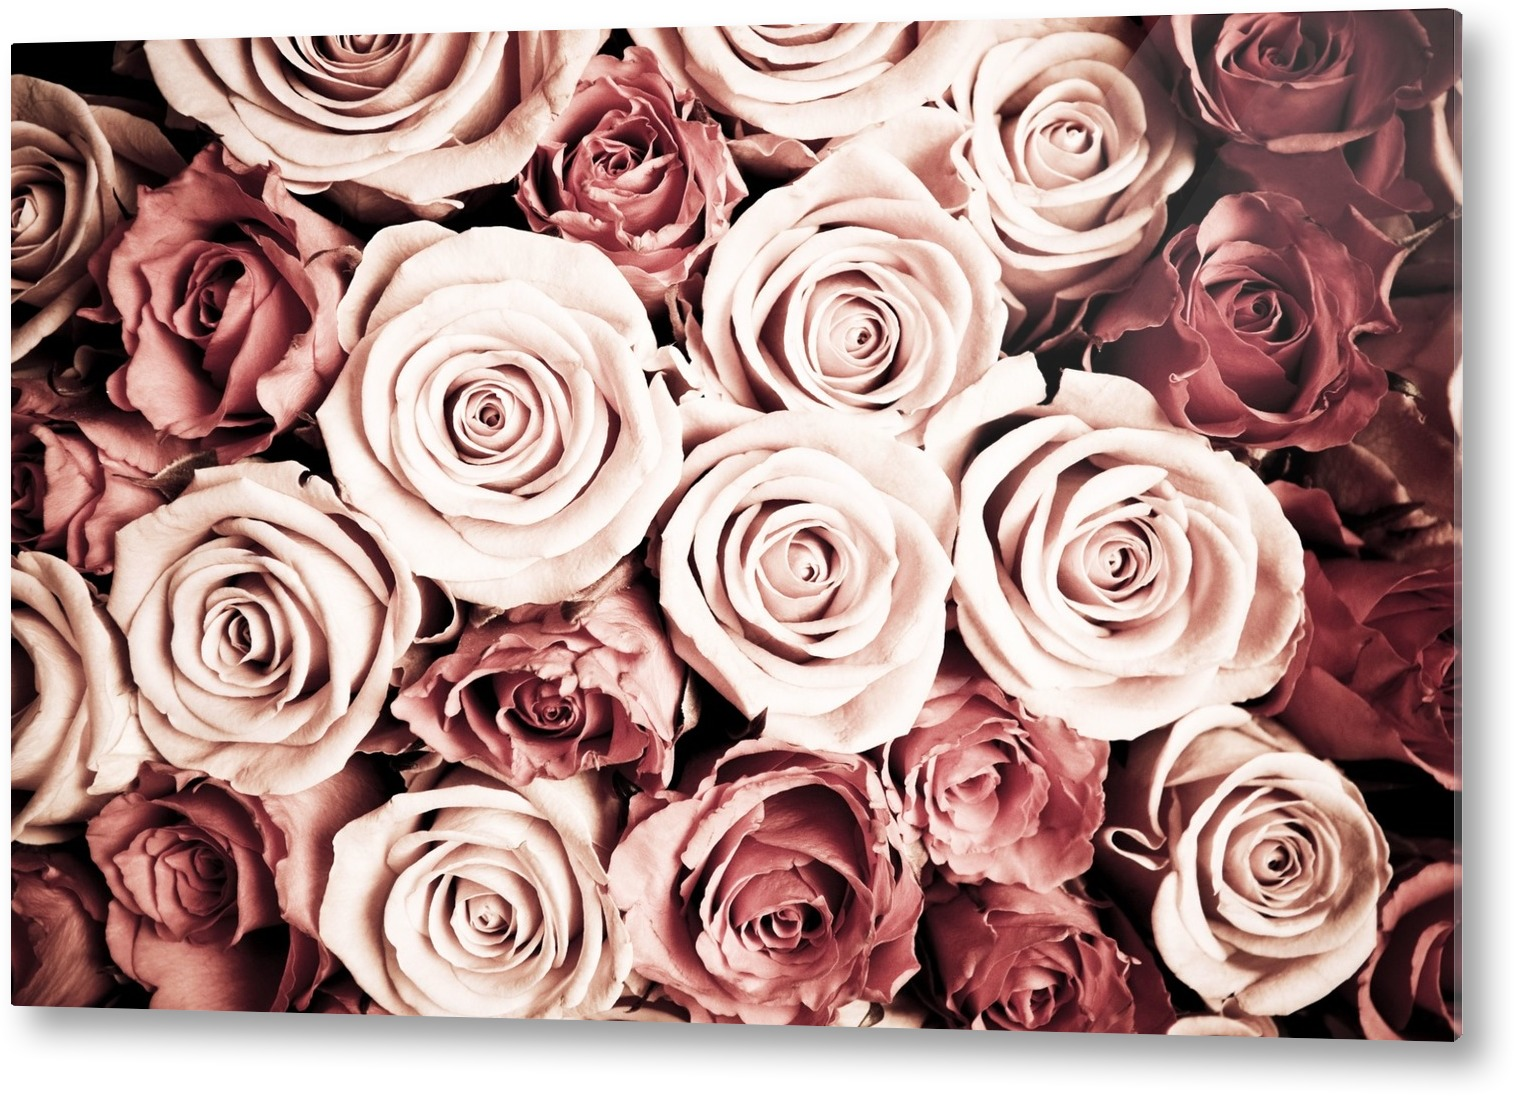 Faktum Kok Matt : faktum kok mott  Rosor tavla Canvastavla Ros Rosa Roda Romantik